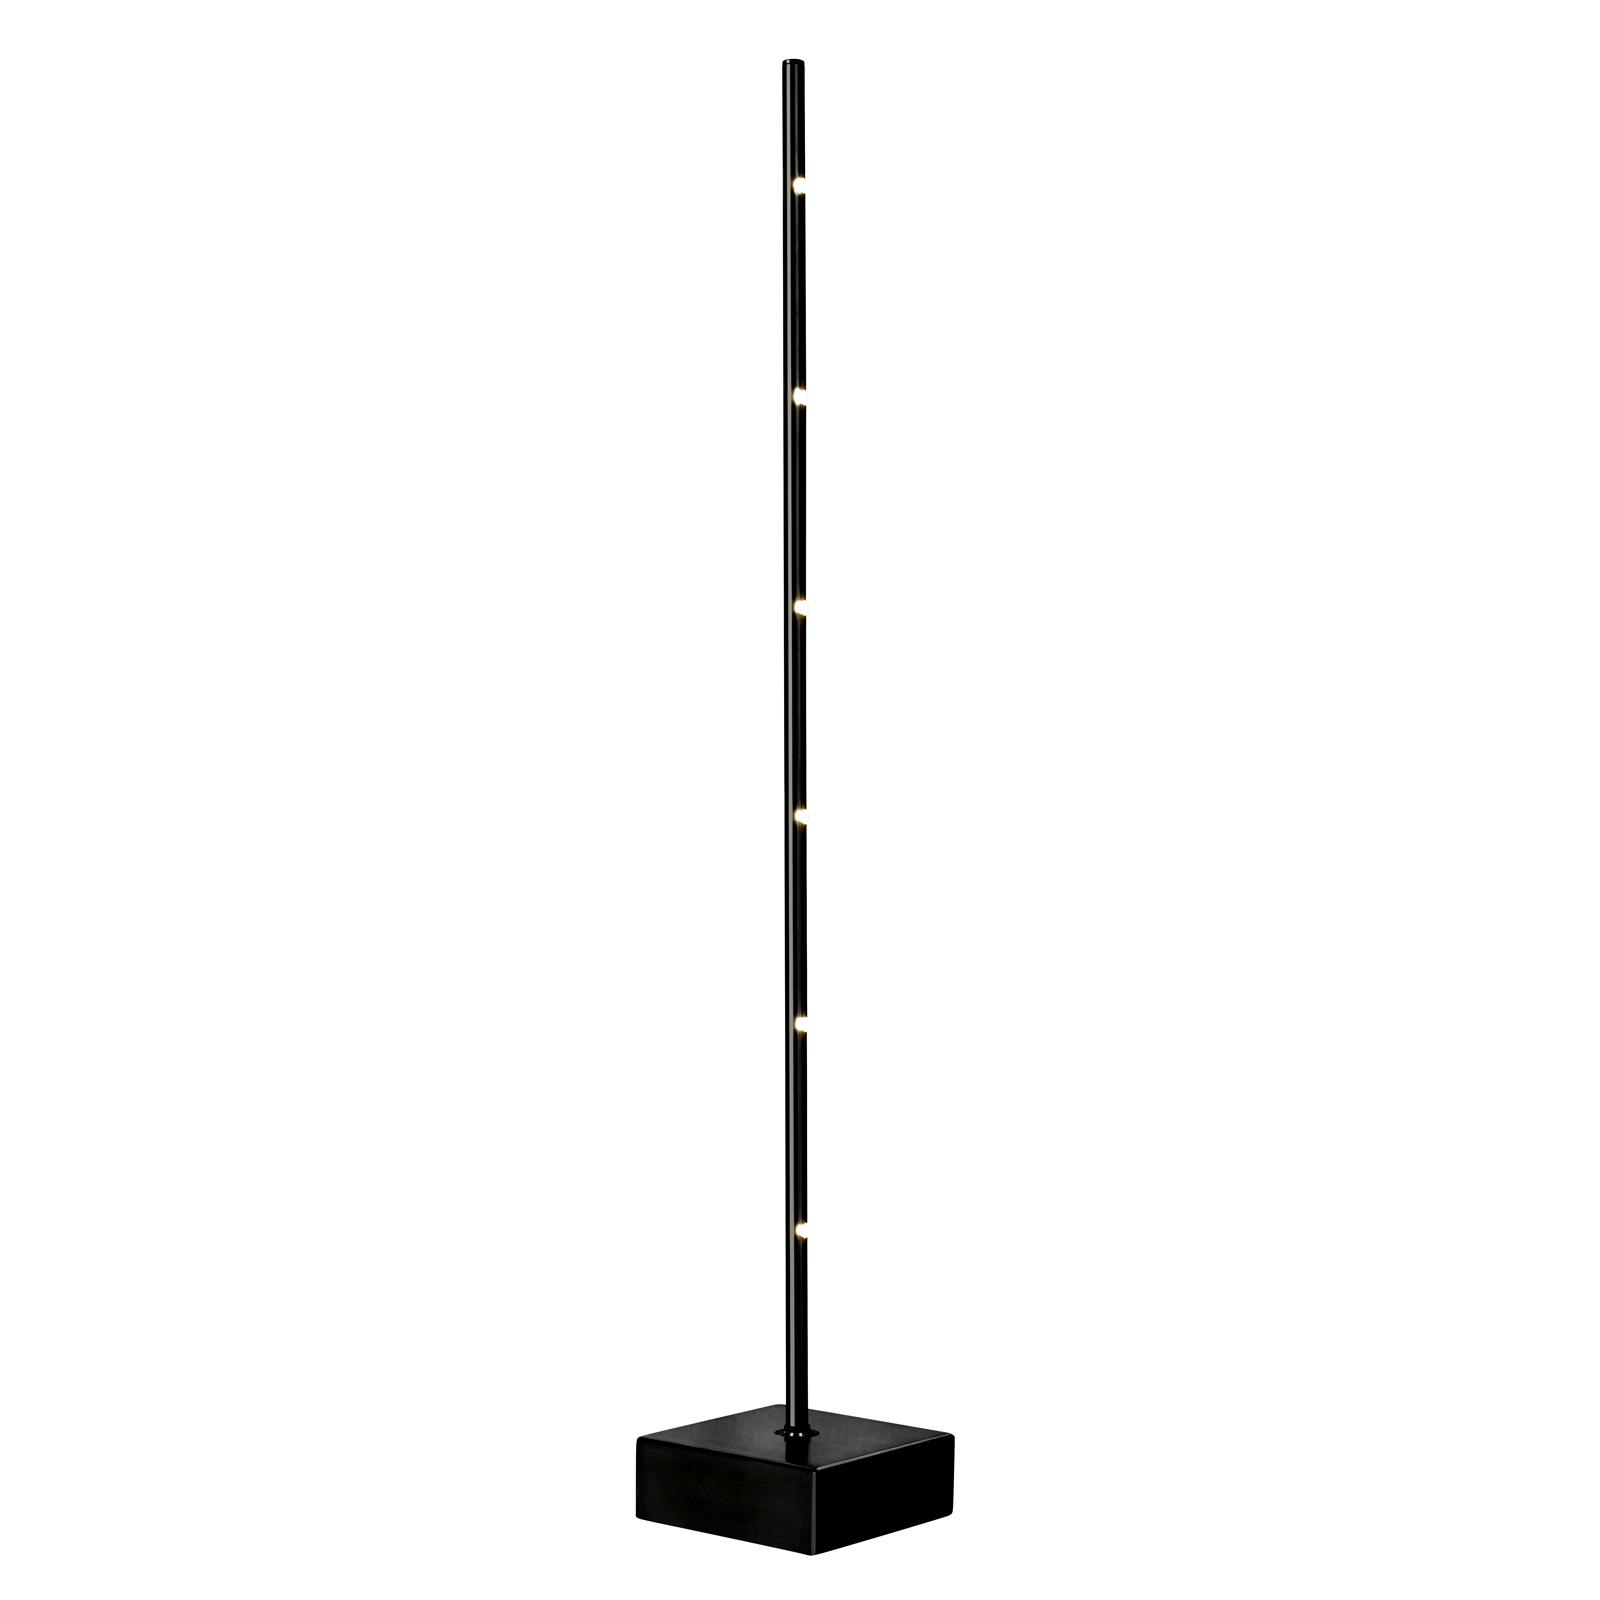 LED-Tischleuchte Pin